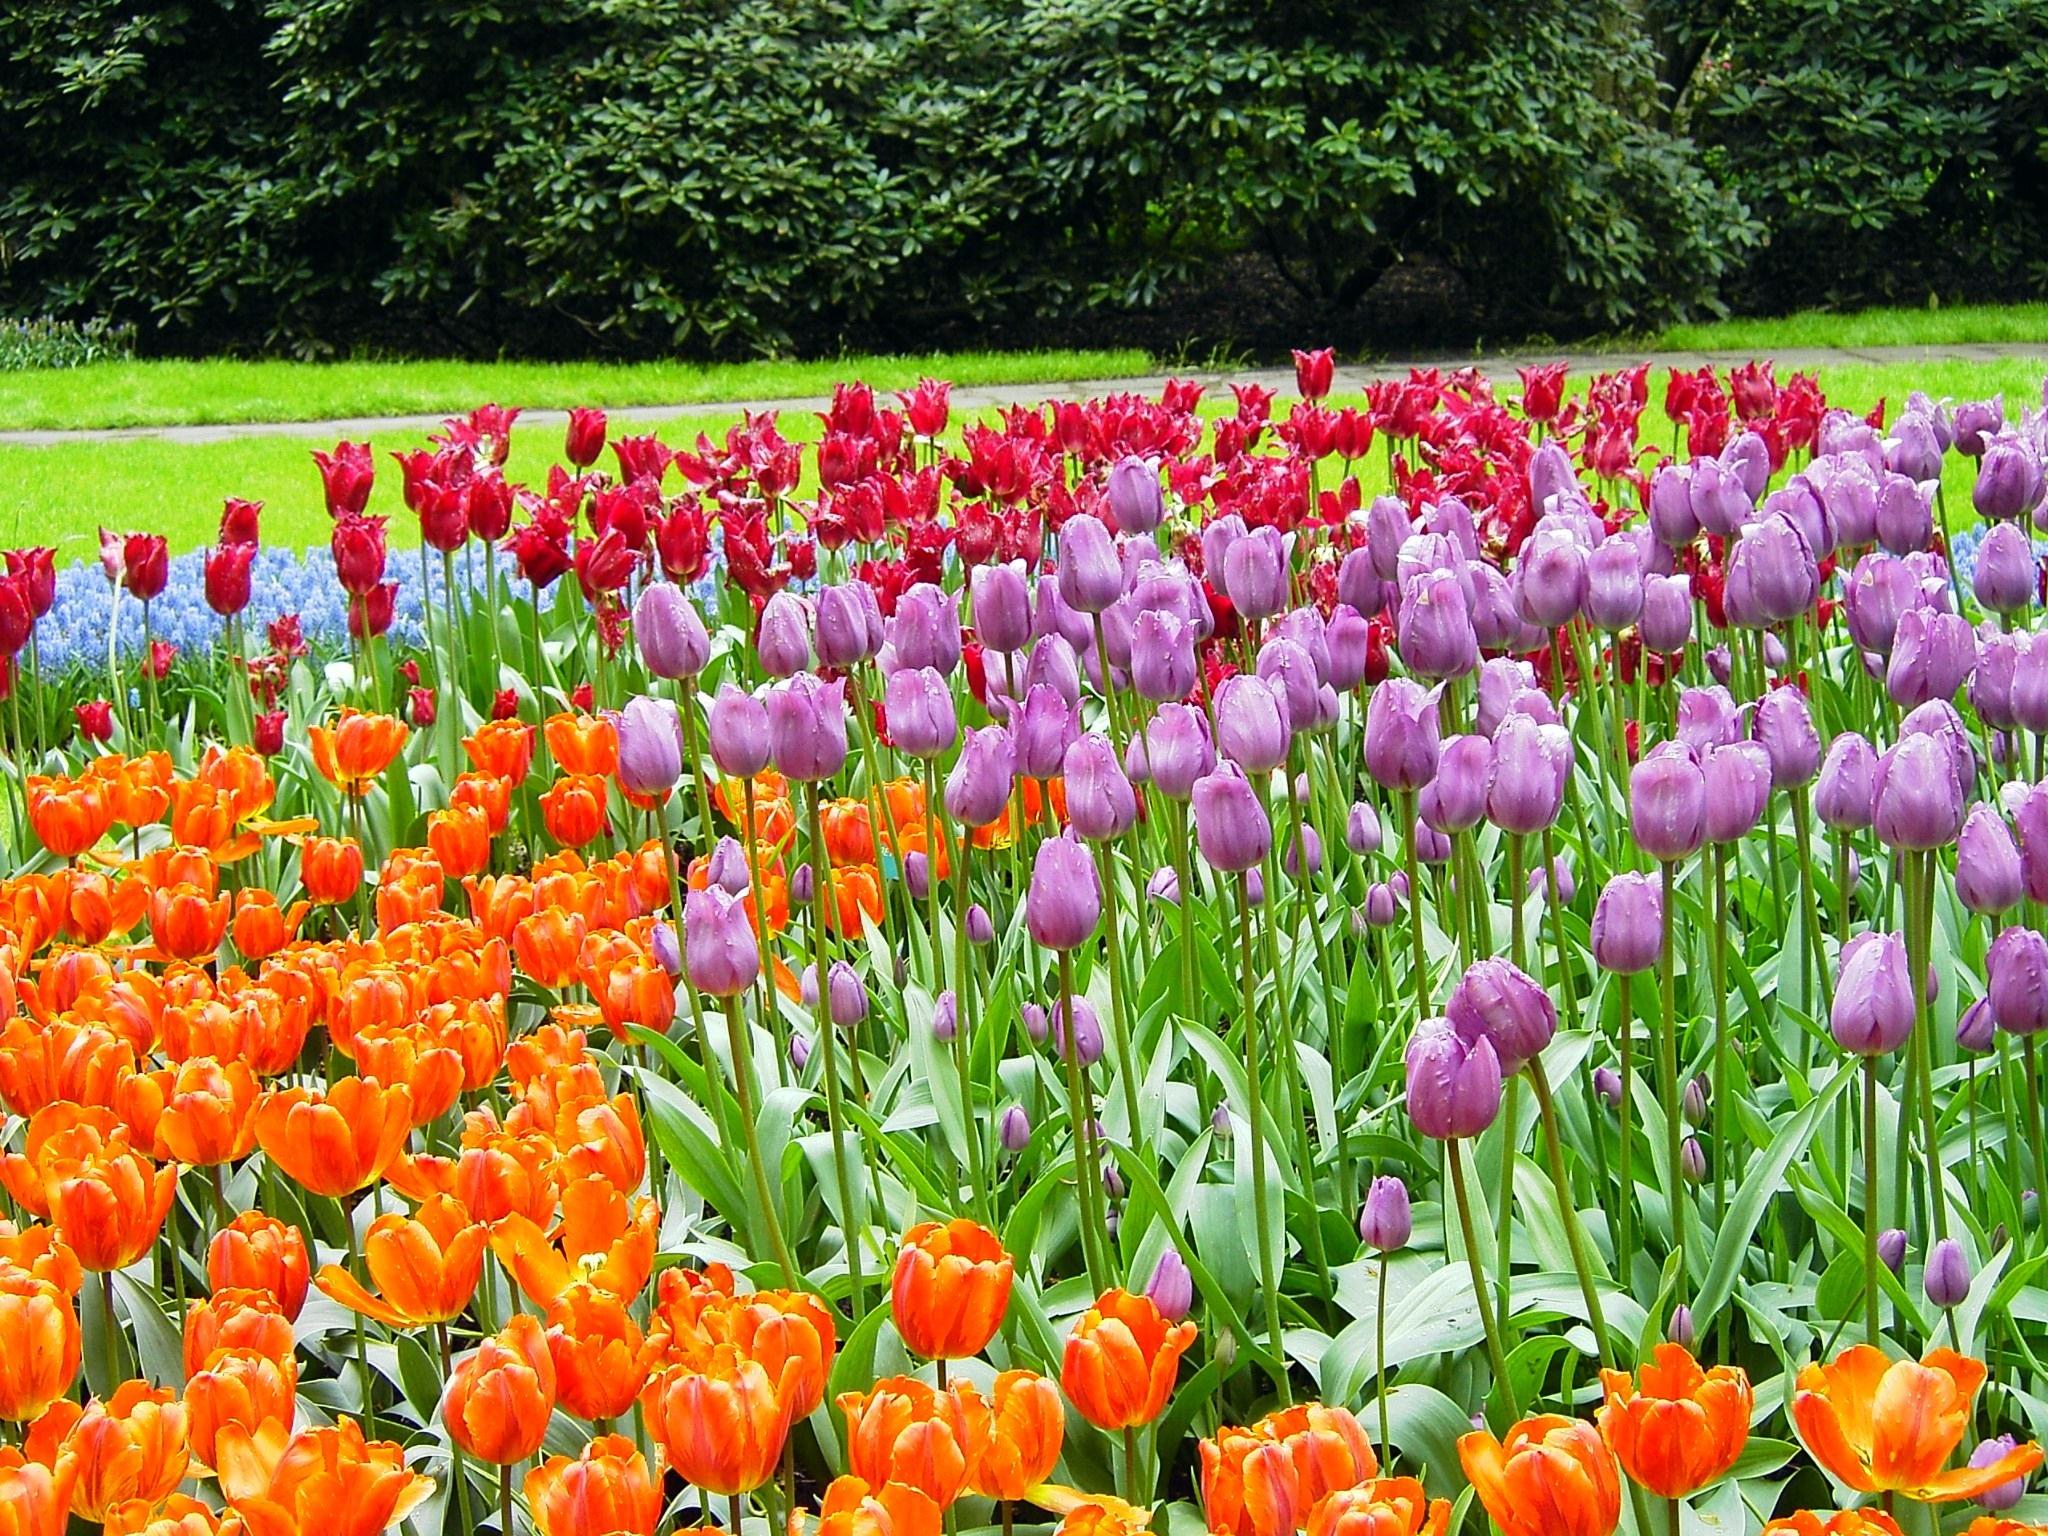 File keukenhof holanda 002 jpg wikimedia commons - Jardines de tulipanes en holanda ...